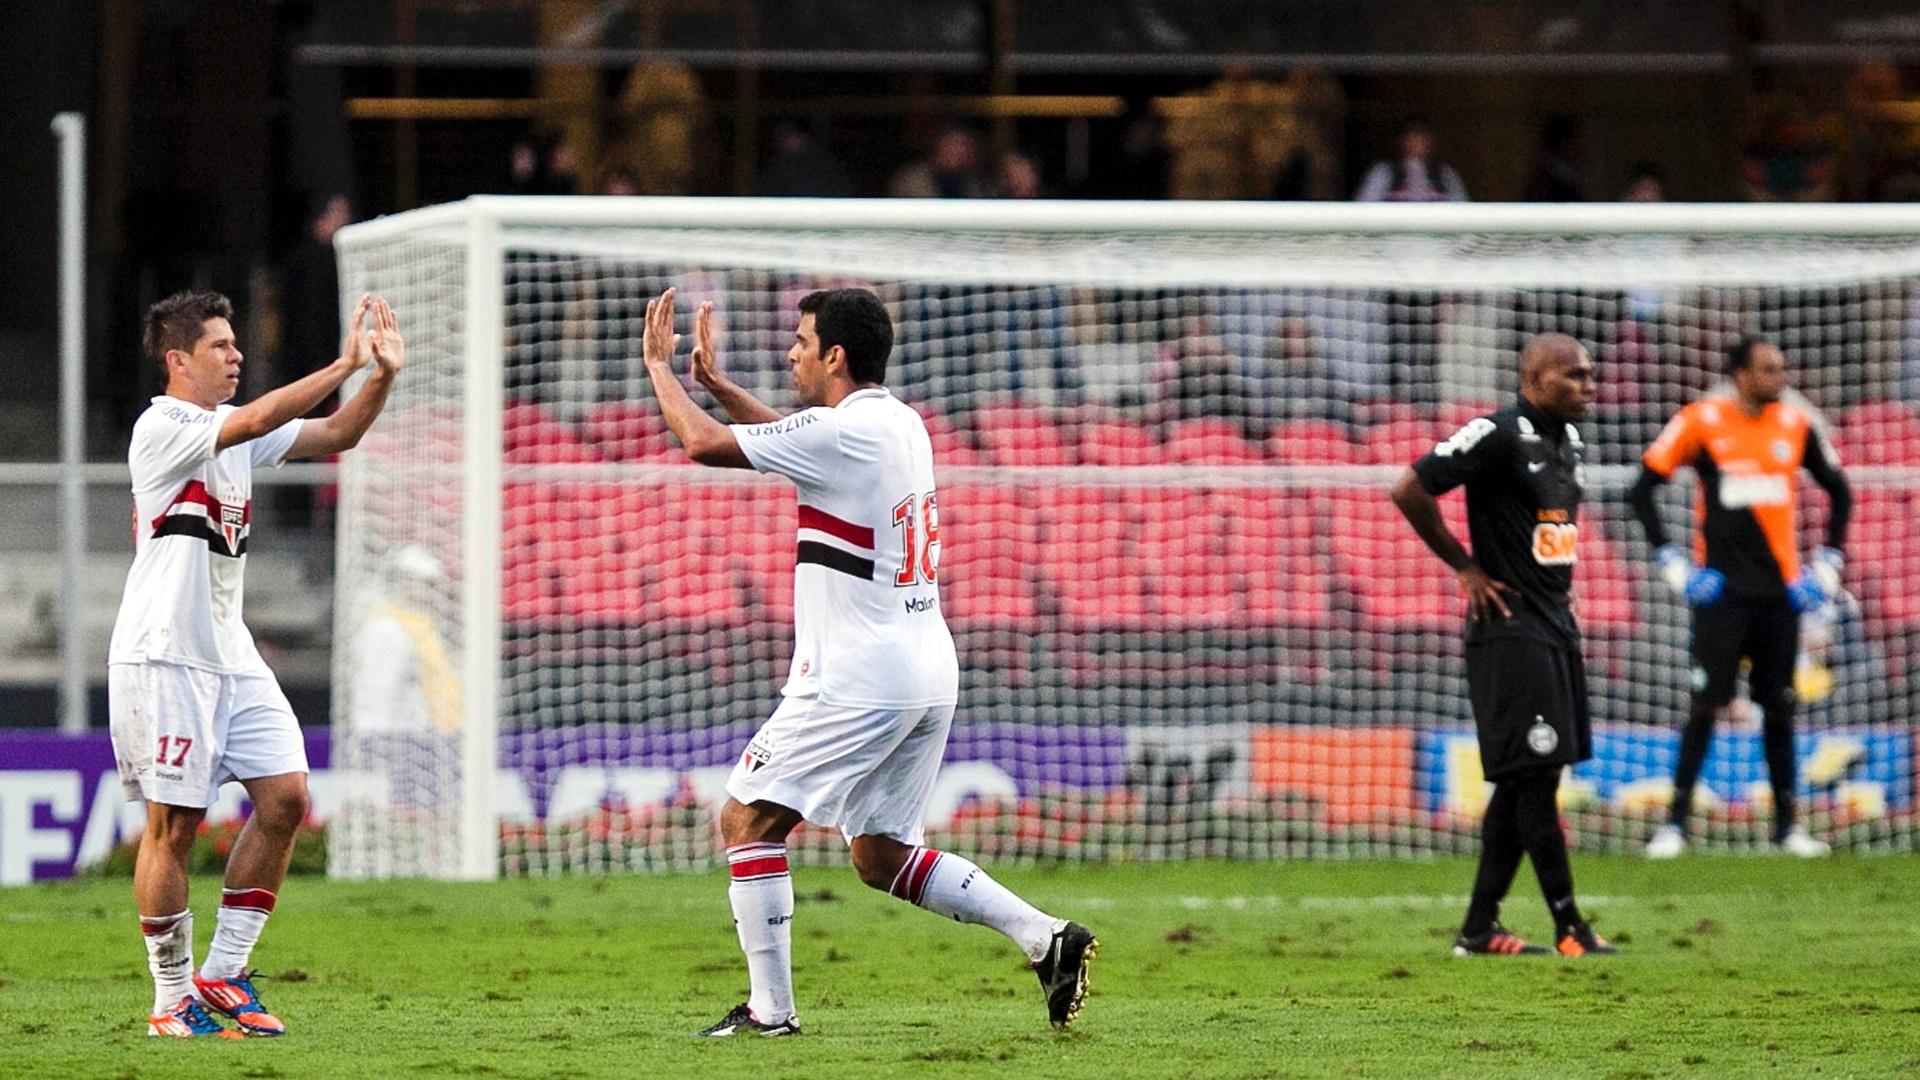 Maicon cumprimenta Osvaldo após marcar o segundo gol do São Paulo contra o Coritiba no Morumbi